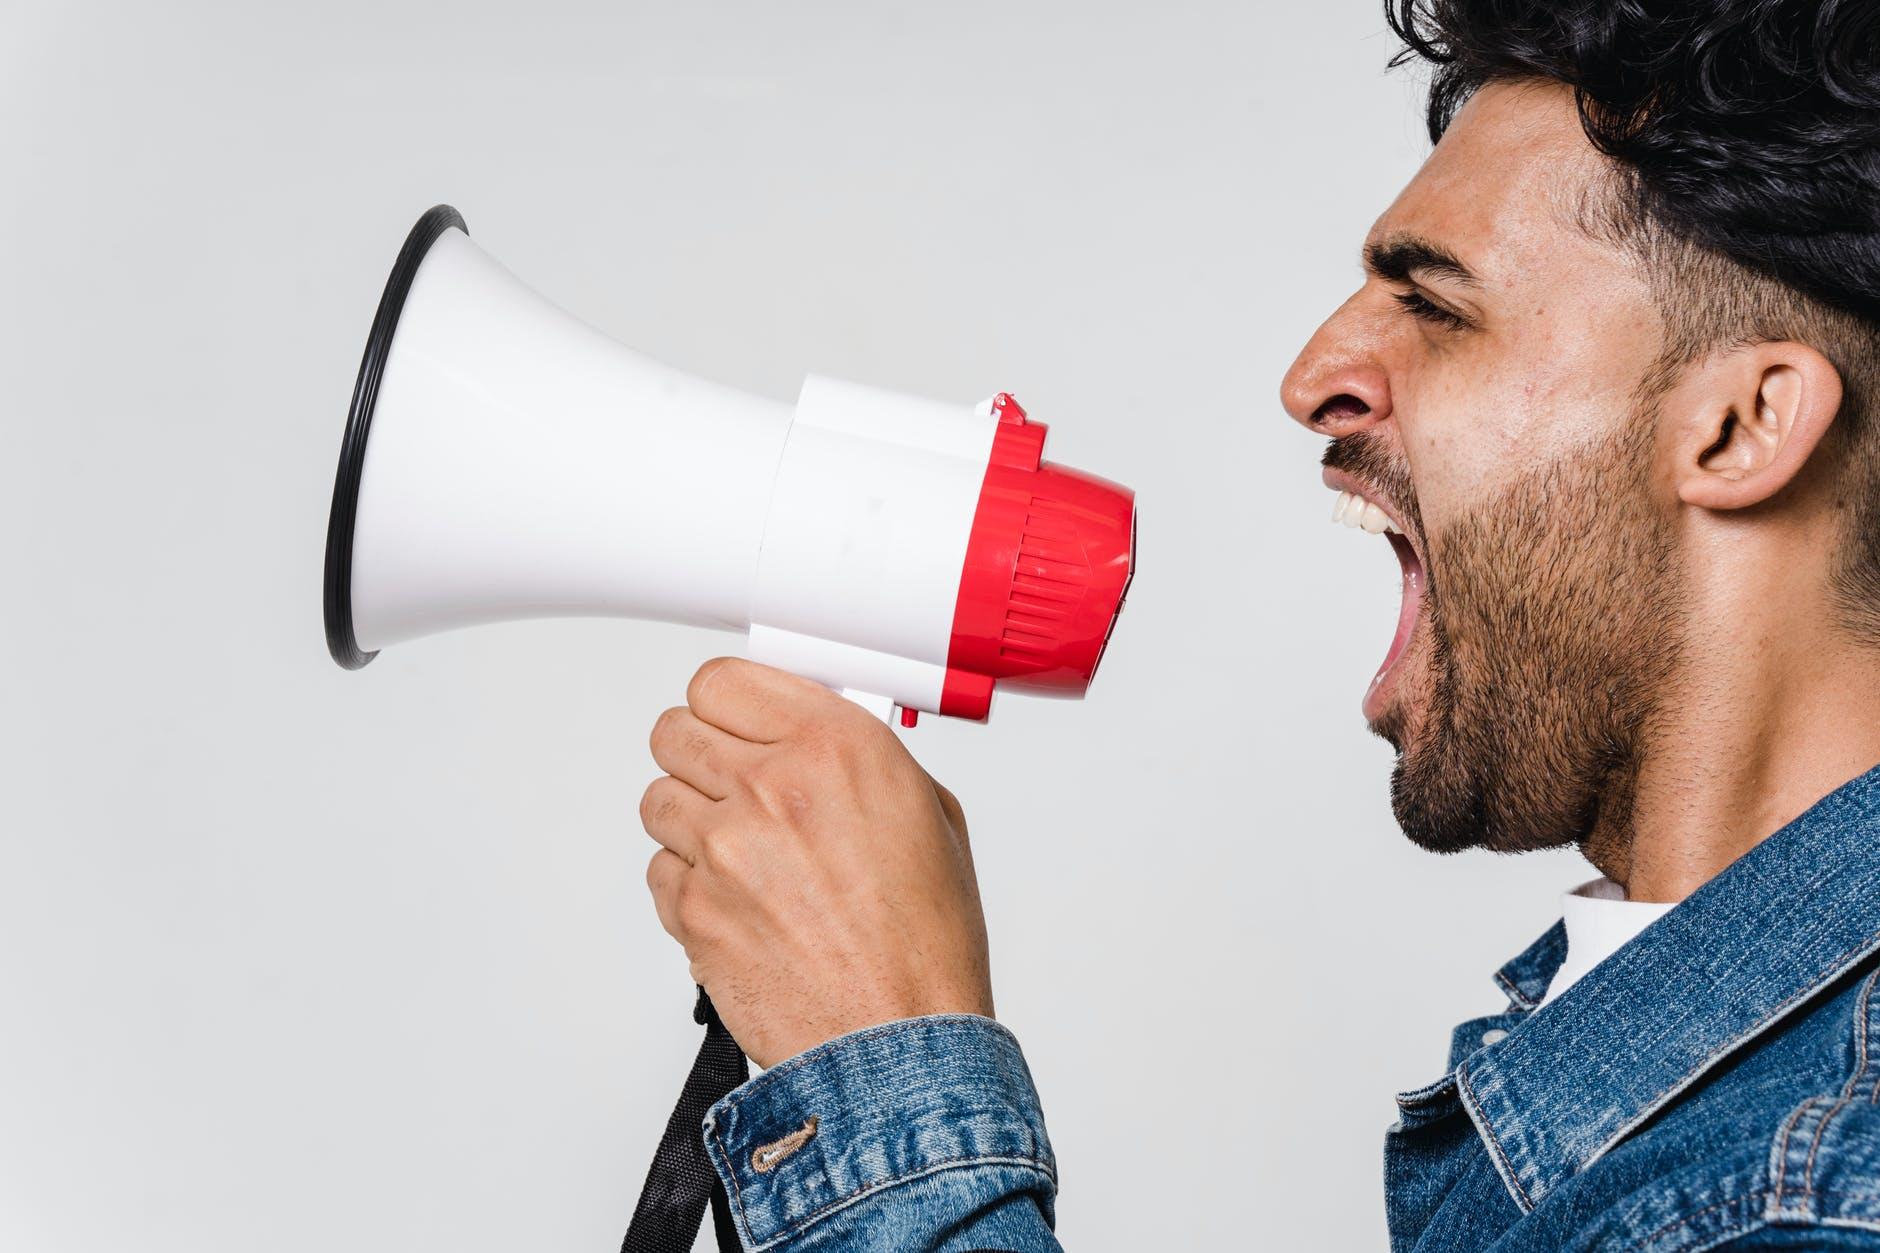 man in blue denim jacket holding a megaphone